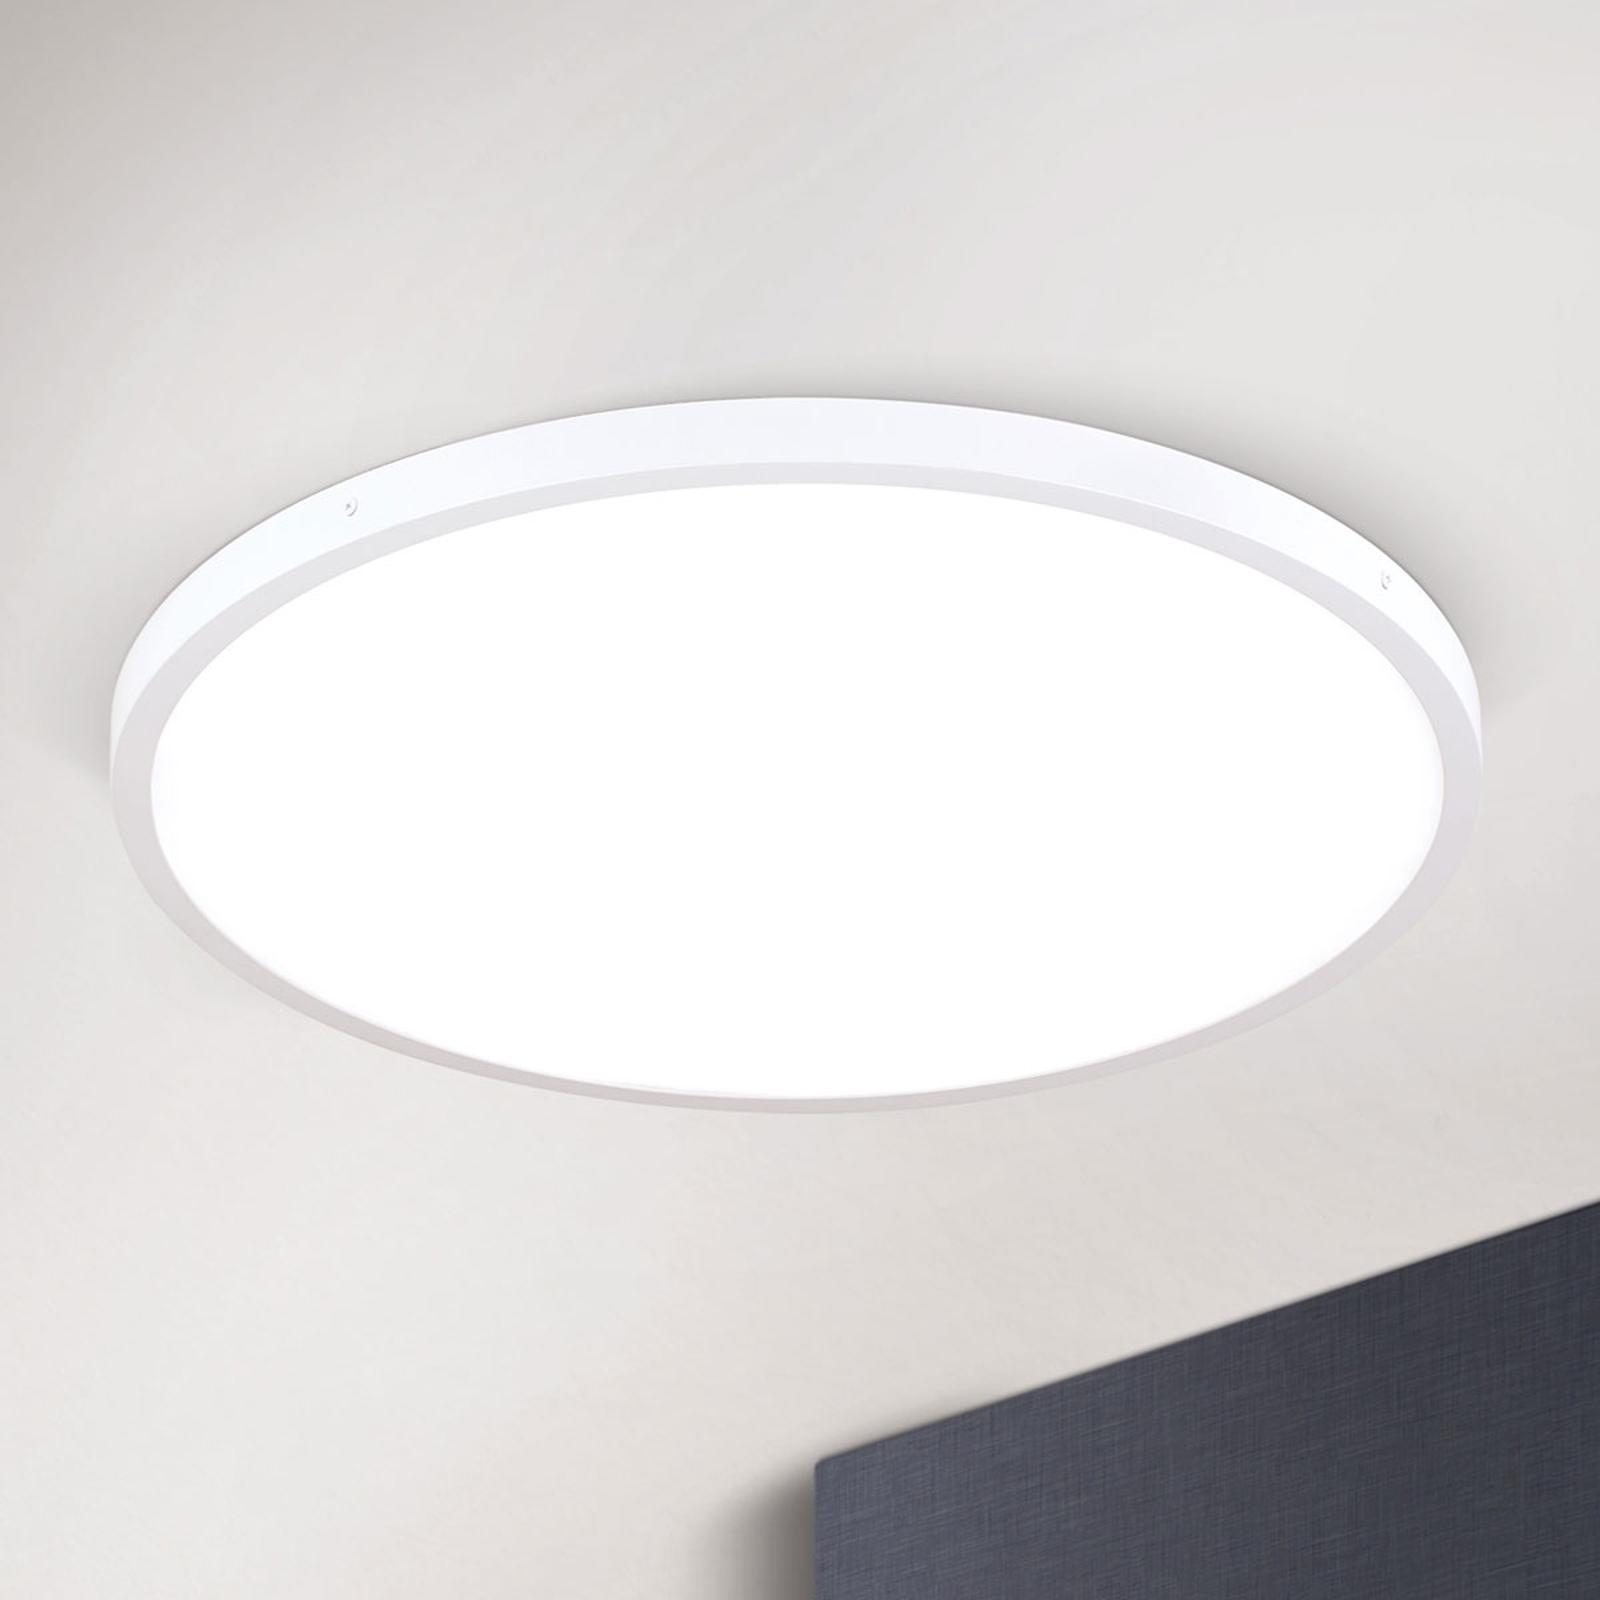 LED-kattovalaisin Lero Ø 60 cm